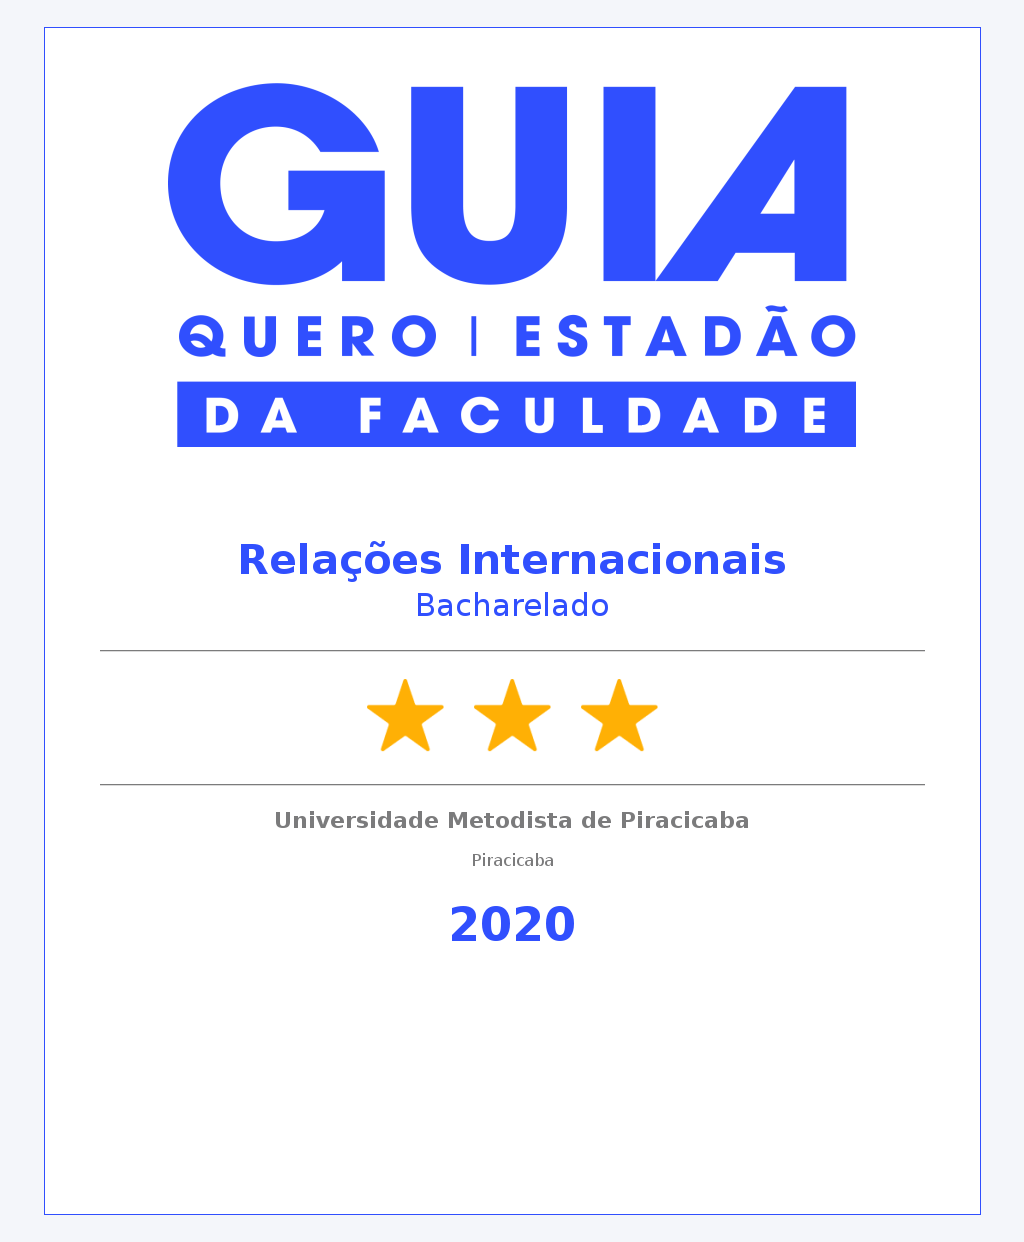 relacoes internacionais.png